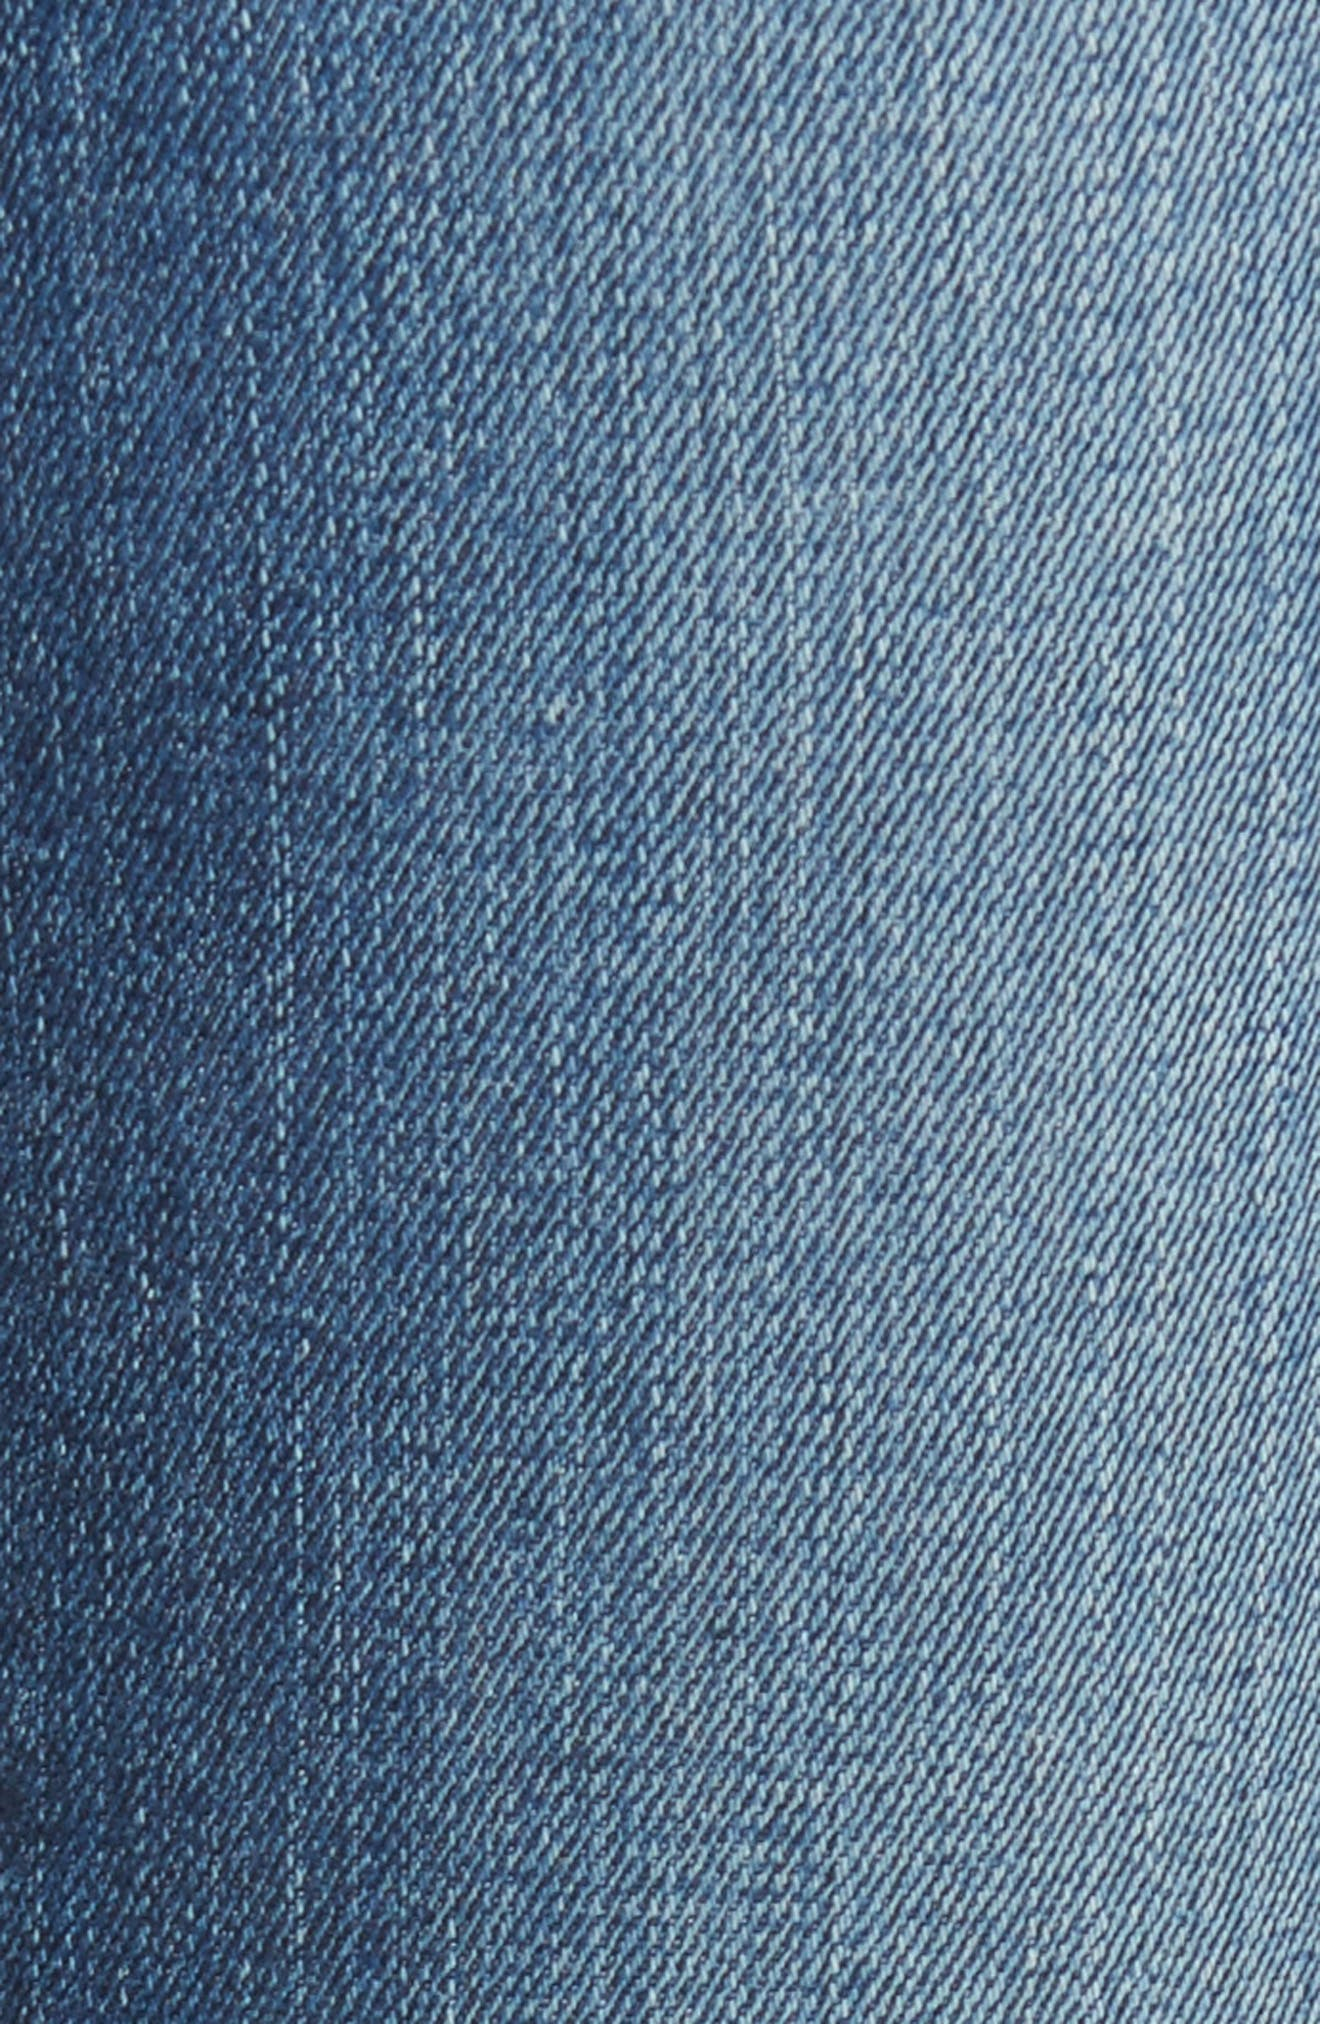 Vintage Slim Ankle Jeans,                             Alternate thumbnail 5, color,                             421